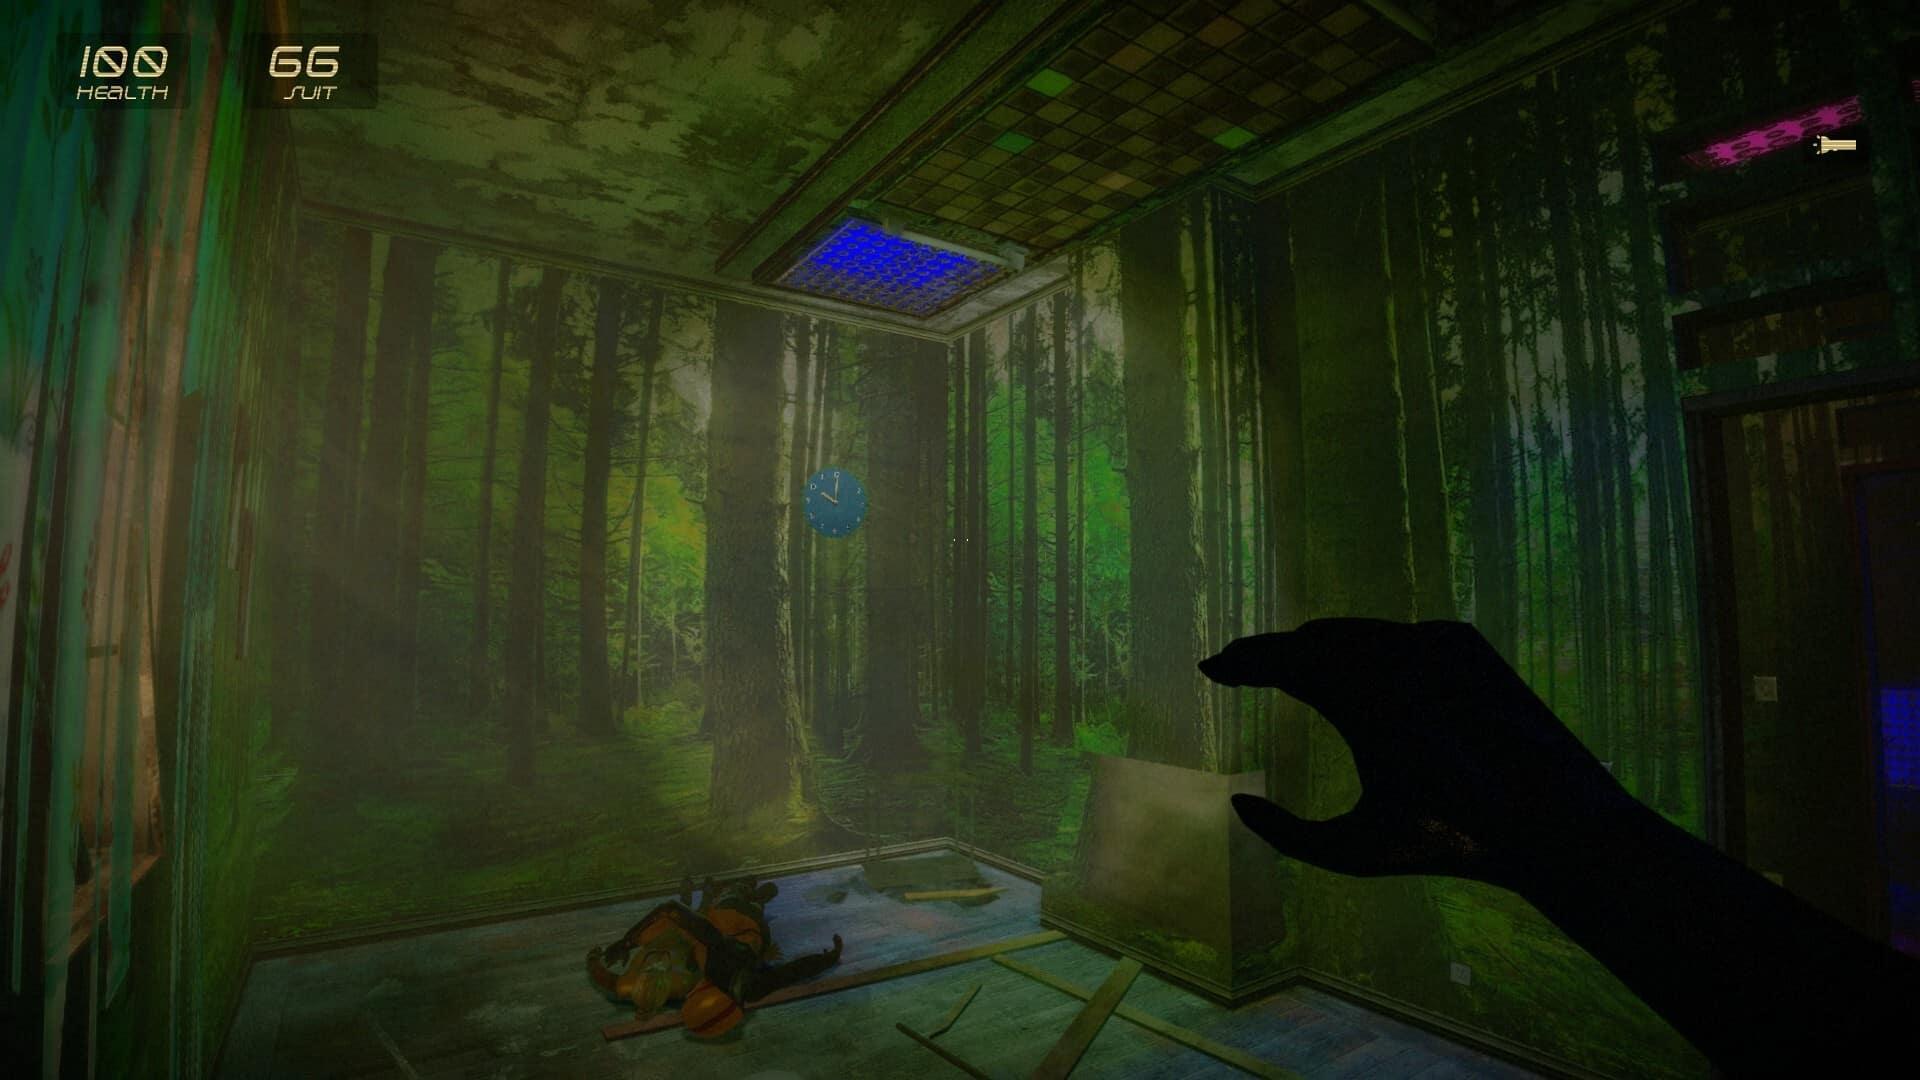 G String Eyaura LunchHouse Software Half-Life 2 mod expansion Myo Hyori cyberpunk adventure Source engine